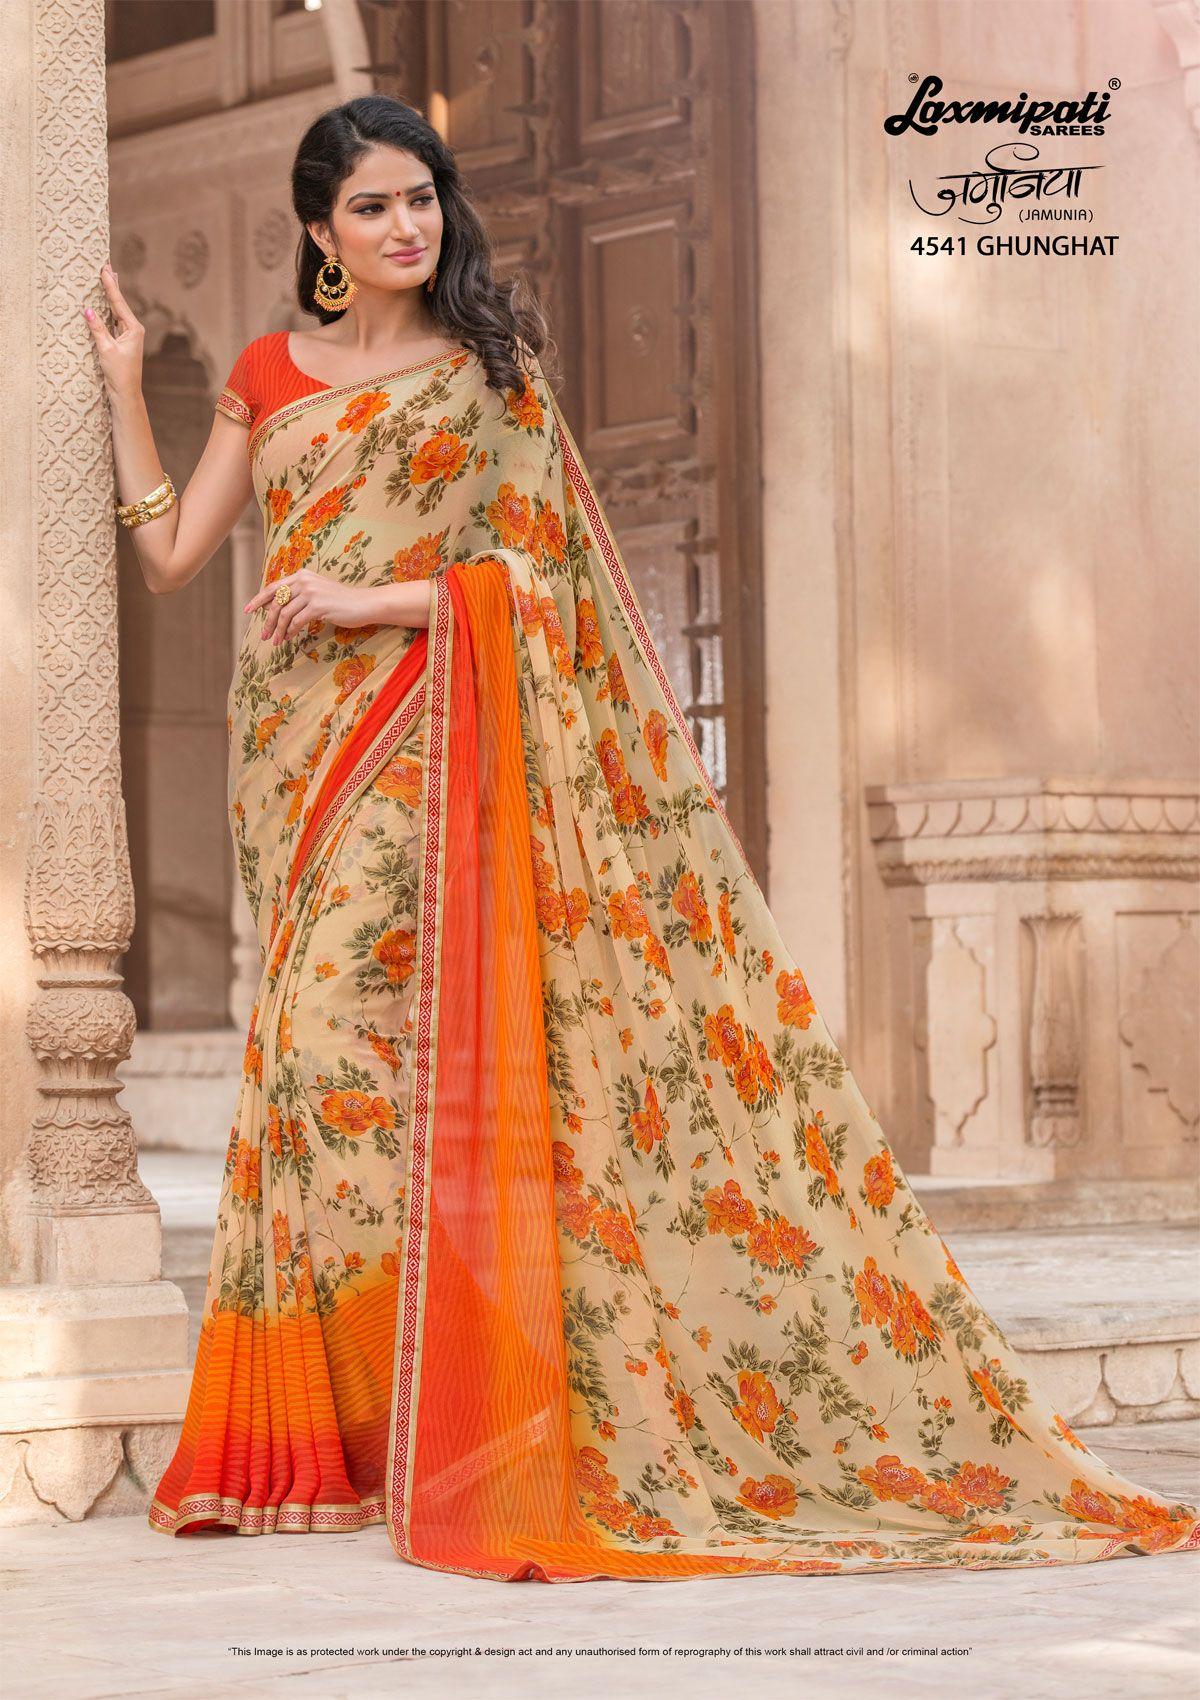 b4adbaa5e3d Buy this Scenic Multicolor Georgette Printed Saree and Orange Rawsilk Blouse  along with Rawsilk Lace Border